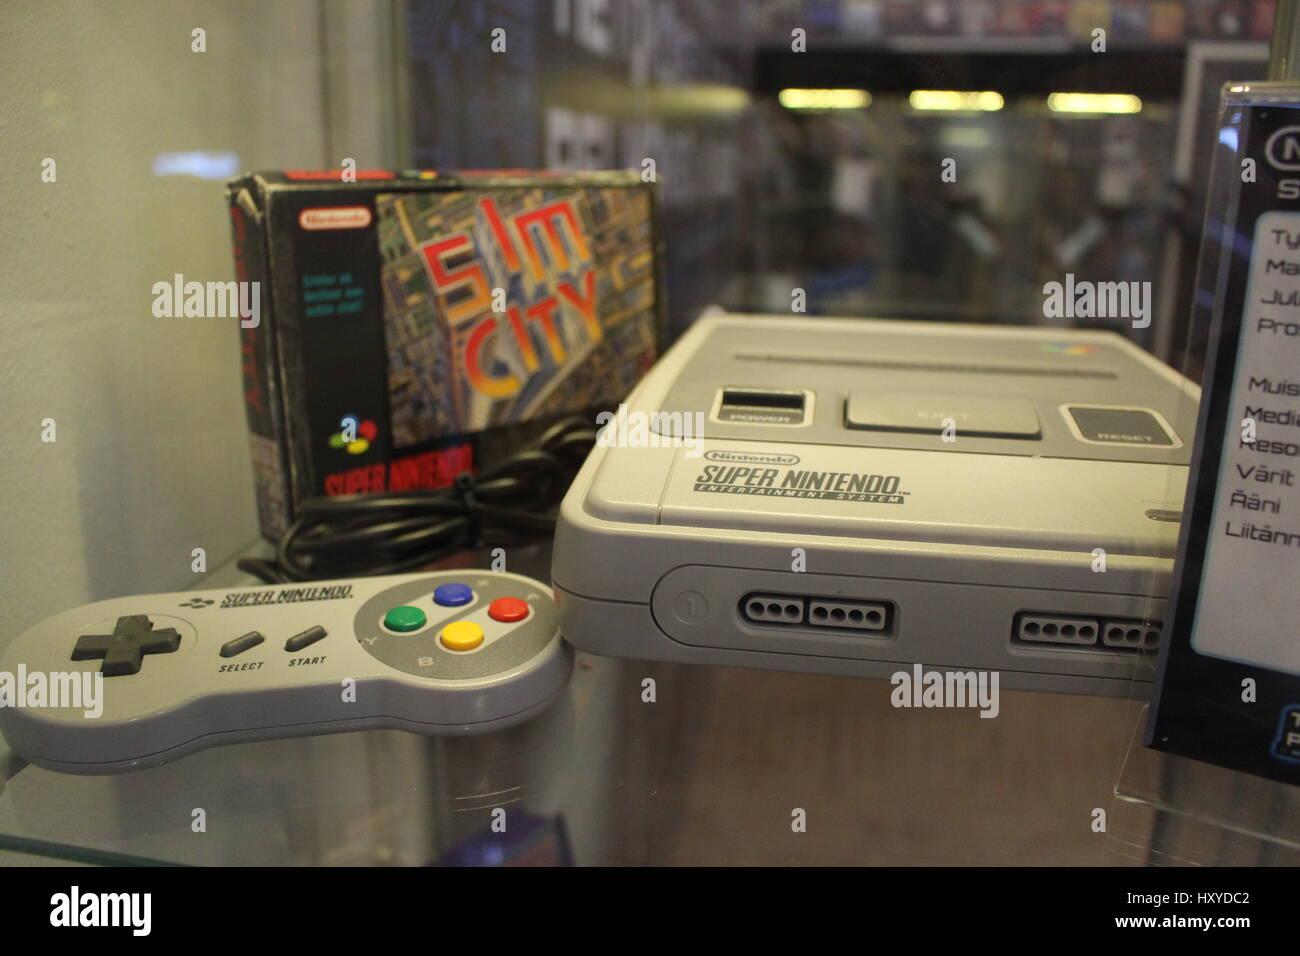 Nintendo 64 Stockfotos & Nintendo 64 Bilder - Alamy